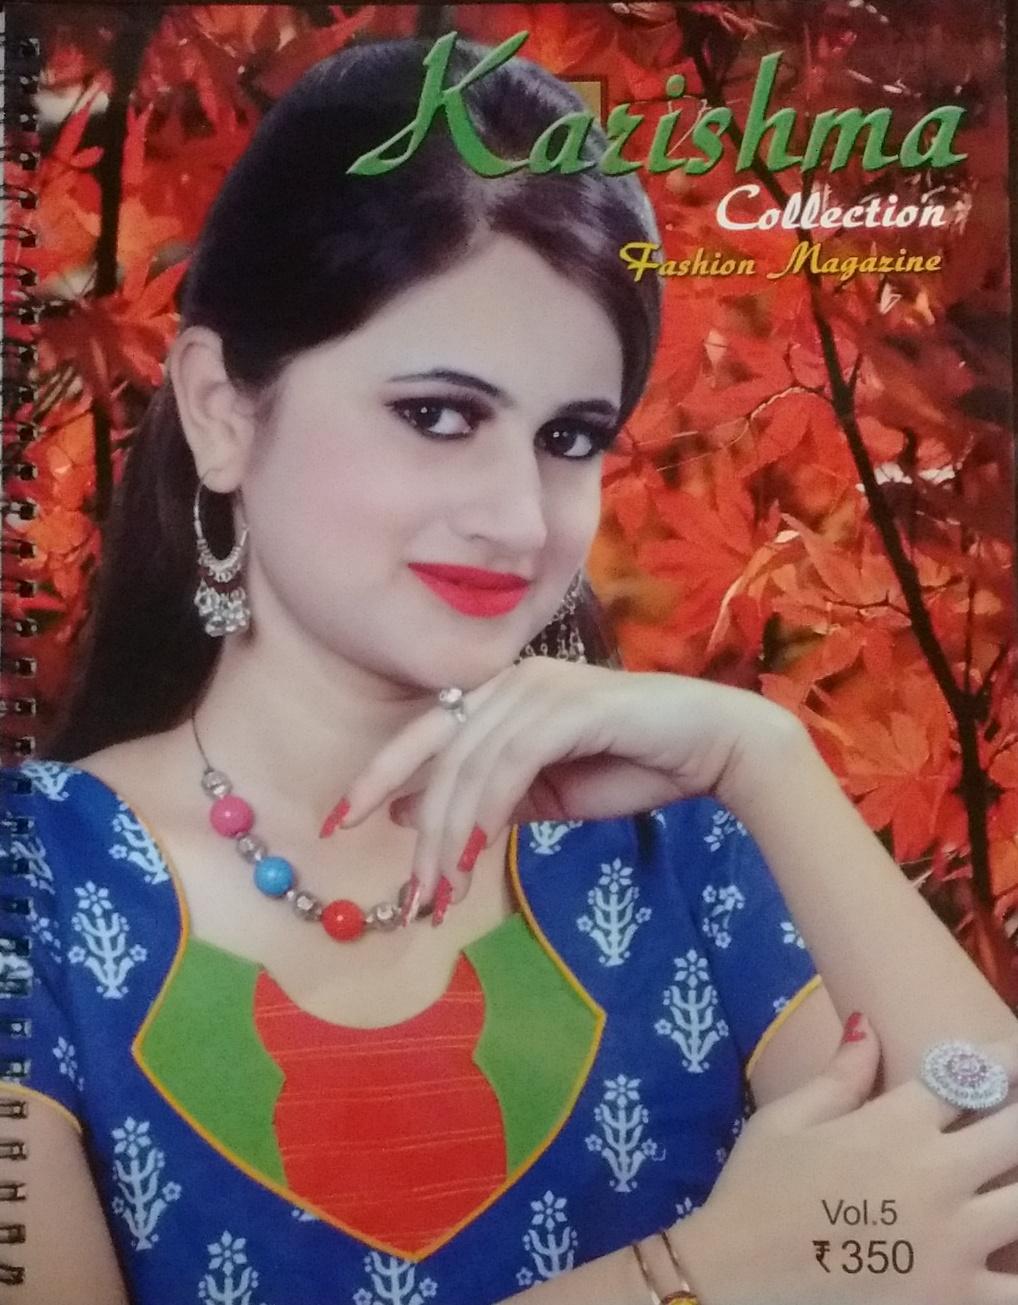 Karishma Collection Fashion Magazine Vol. 5